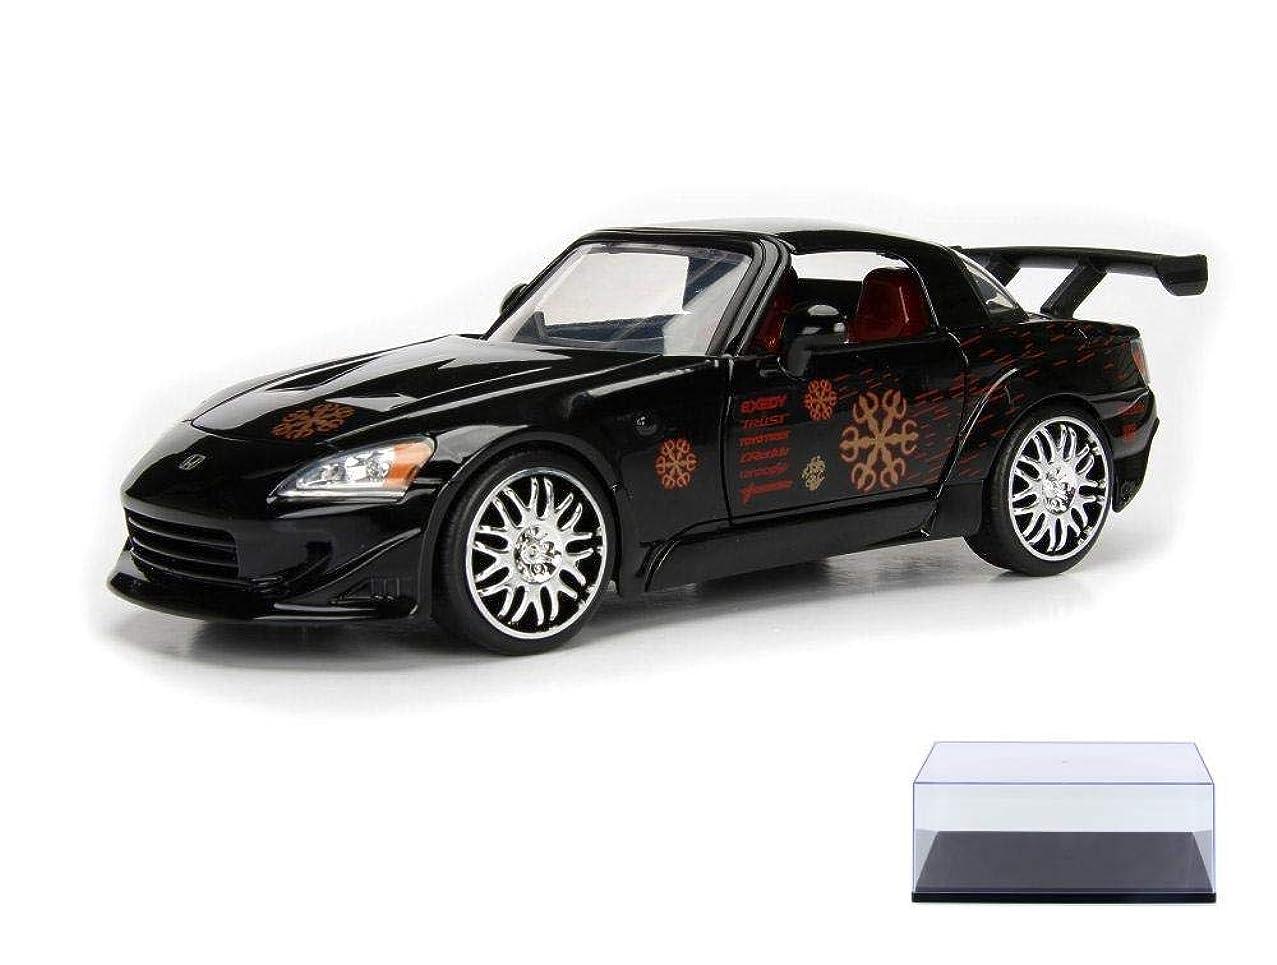 Diecast Car & Display Case Package - 2000 Honda S2000 (Johnny Tran), Fast & Furious - Jada 99557 - 1/24 Scale Diecast Model Toy Car w/Display Case